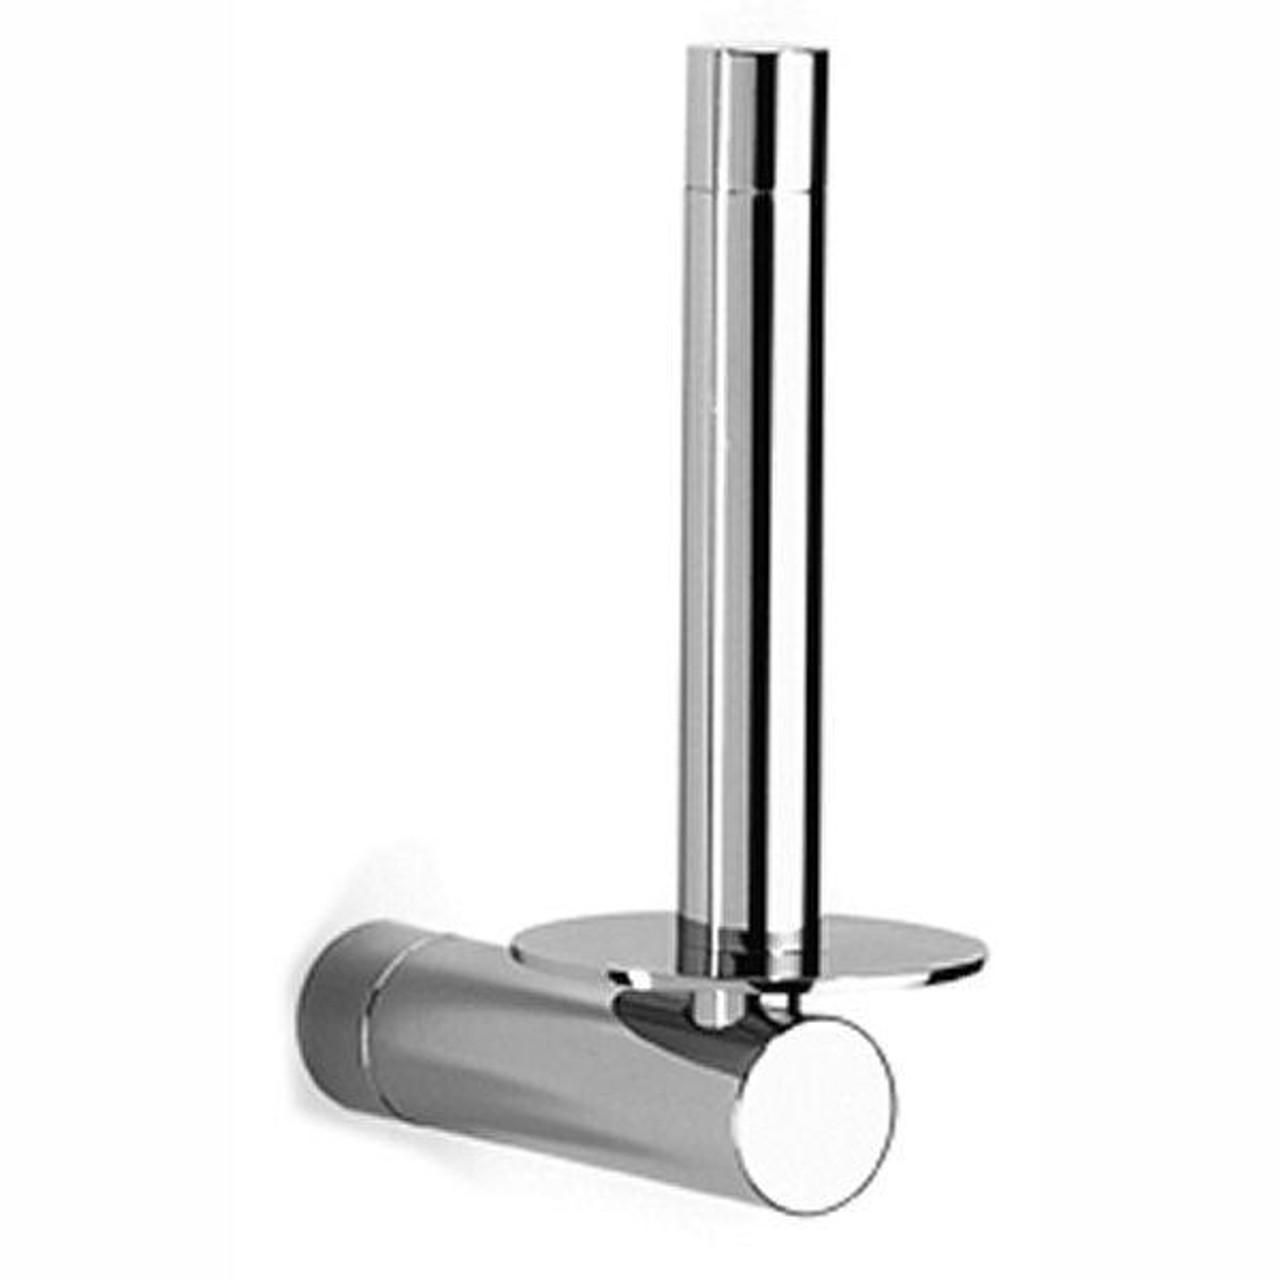 Chrome Plated Samuel Heath Xenon Spare Toilet Roll Holder N5031